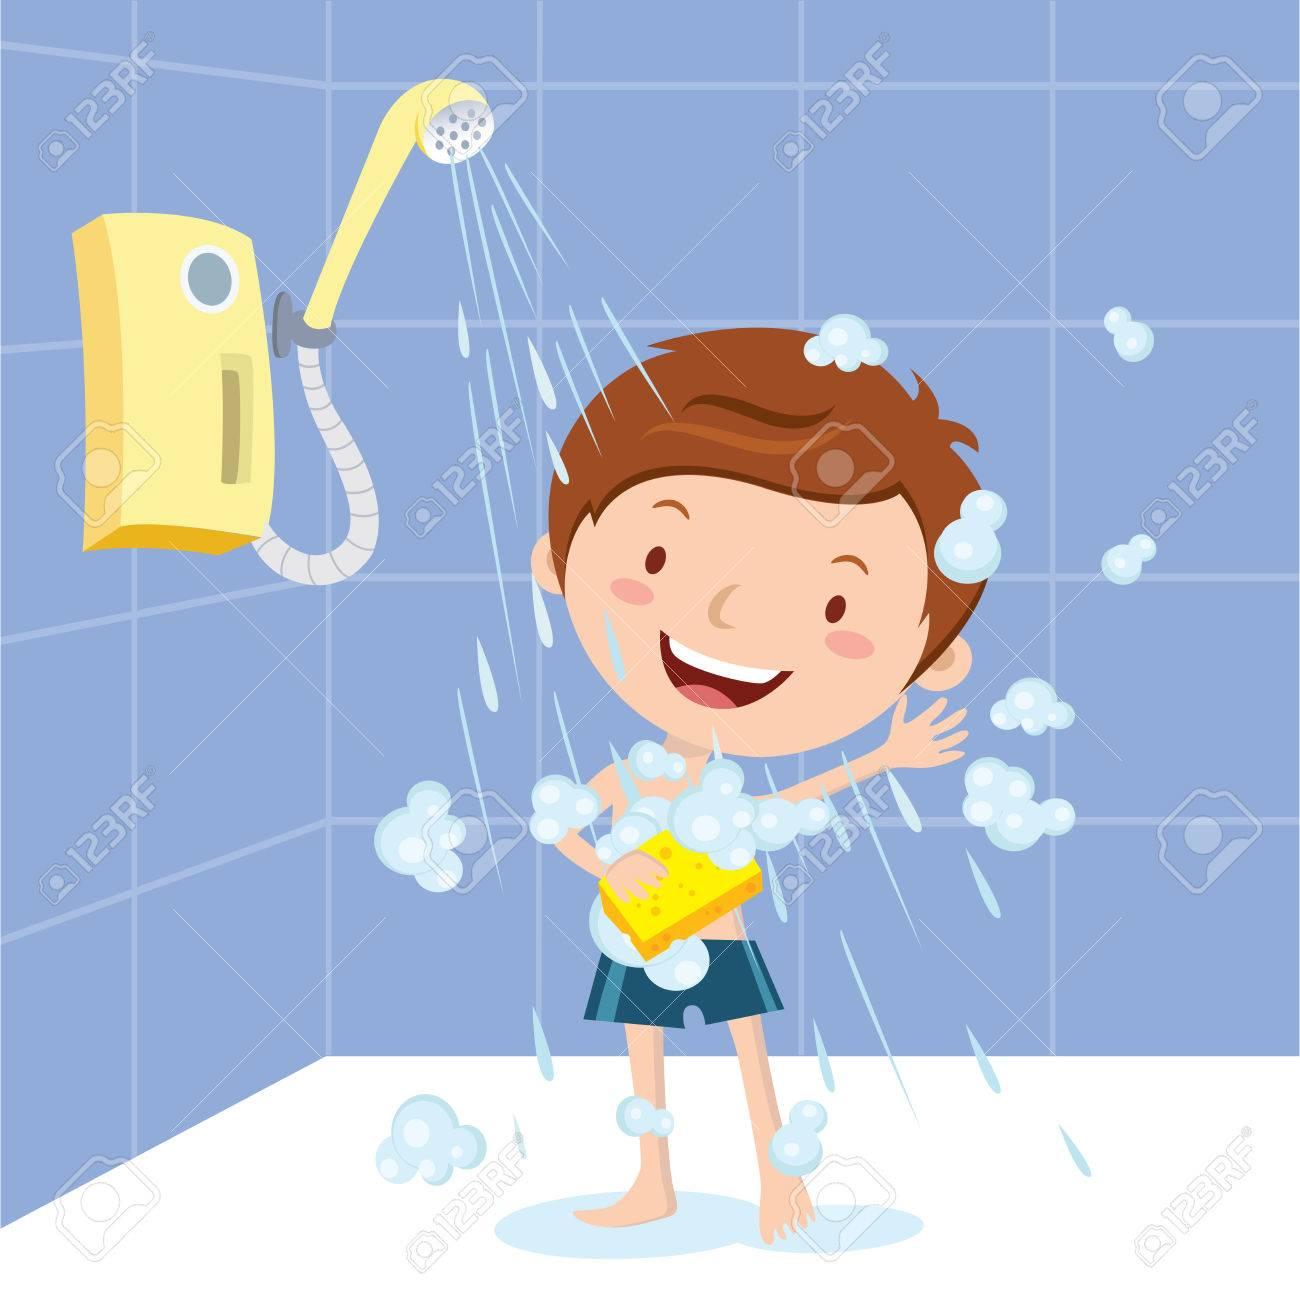 Boy shower - 66571275